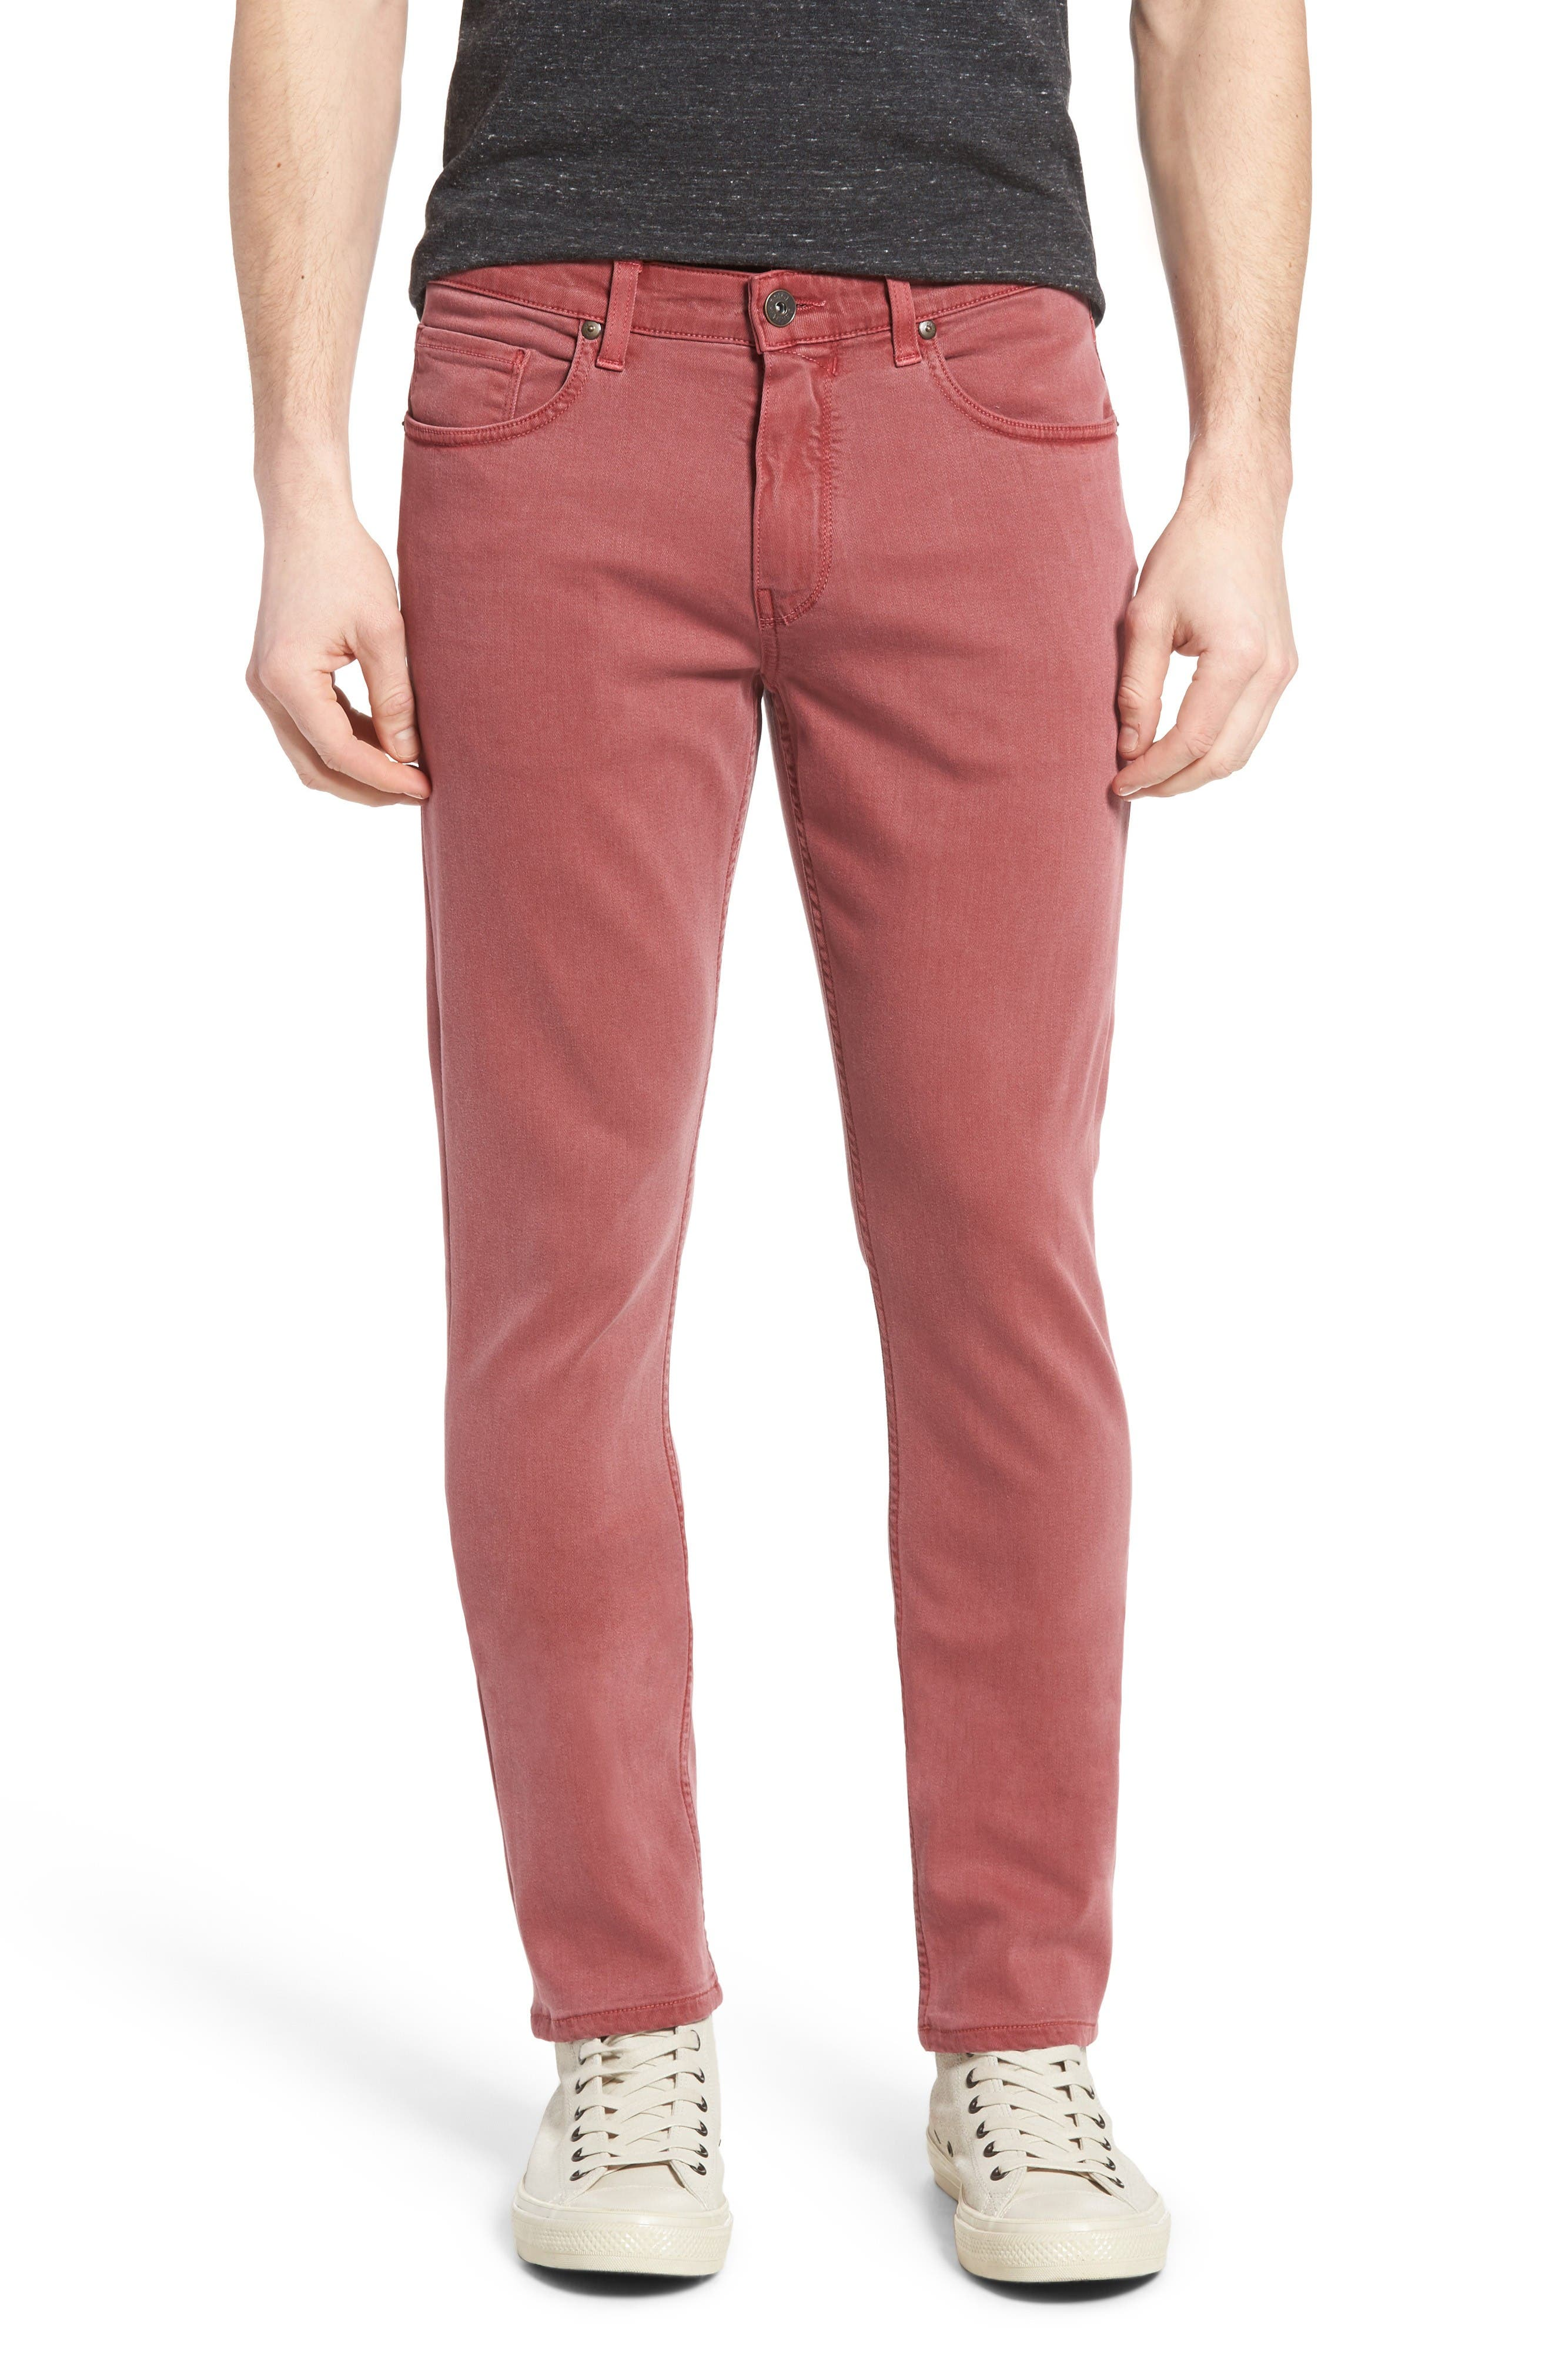 Transcend - Lennox Slim Fit Jeans,                         Main,                         color, Radish